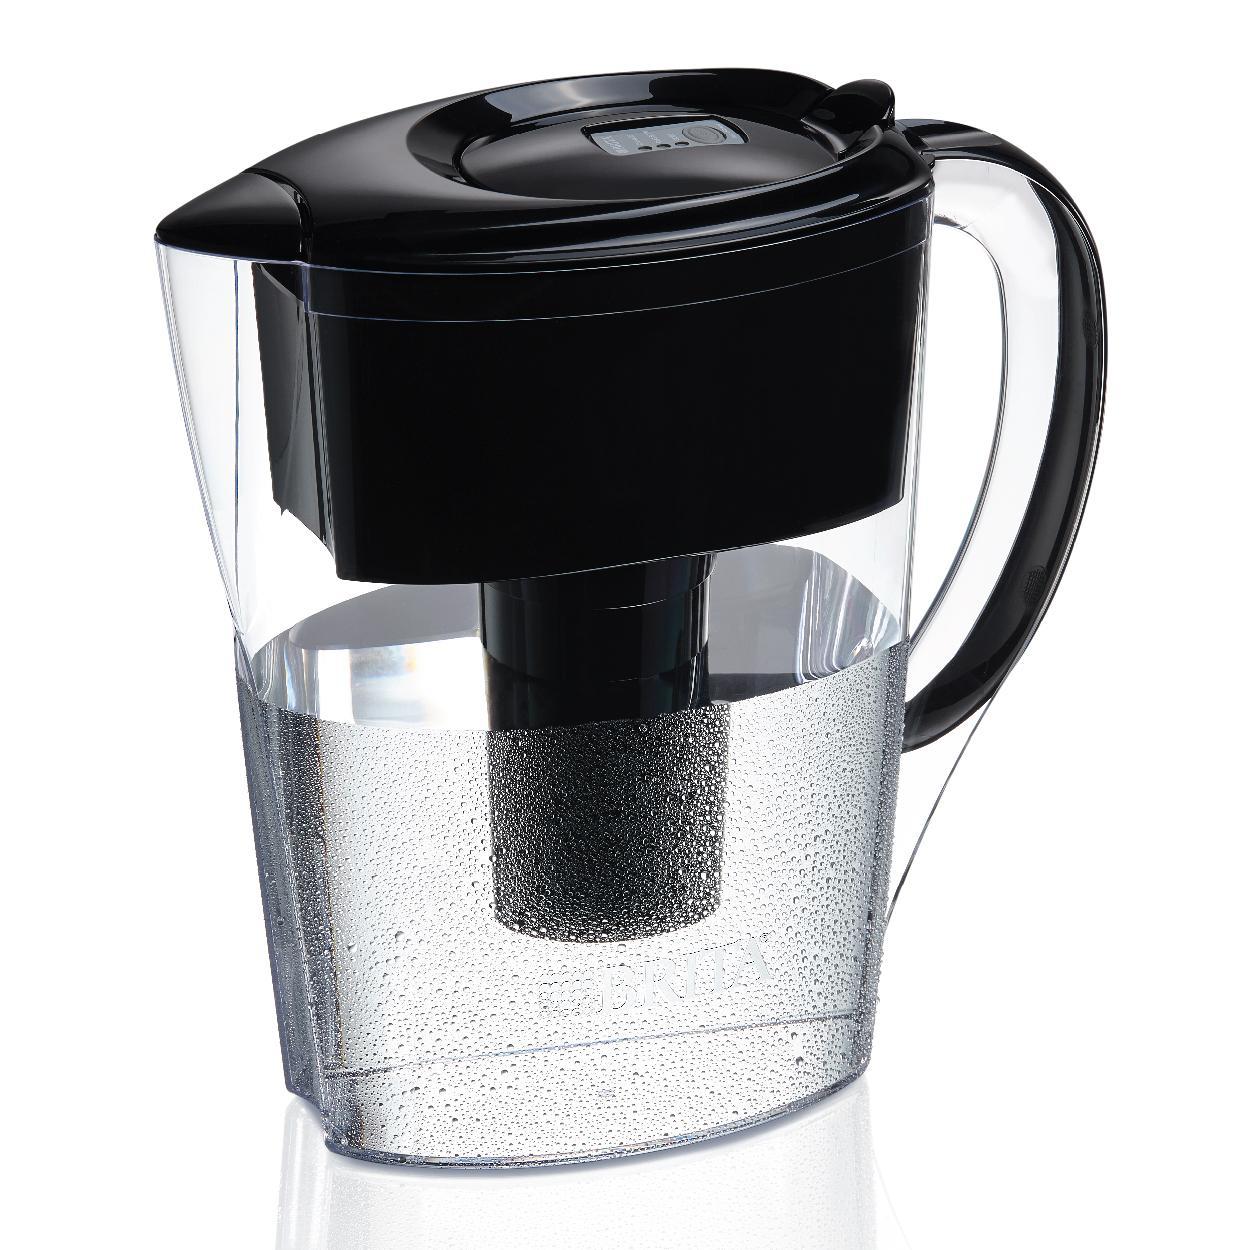 Brita Space Saver Water Filter Pitcher Black